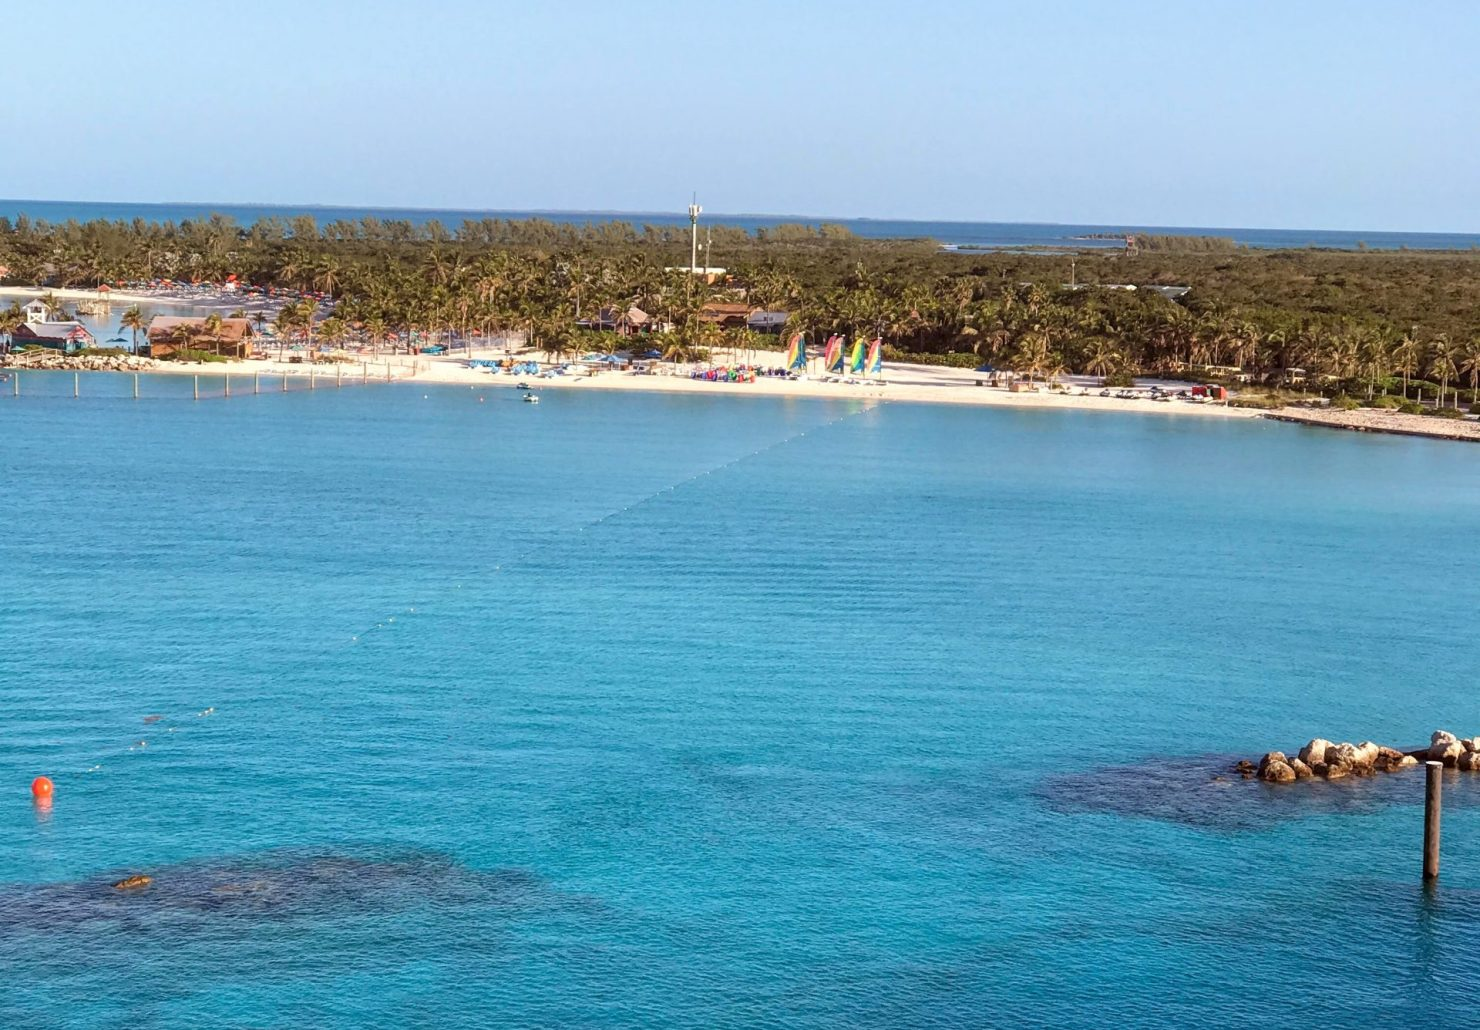 sky view of beach